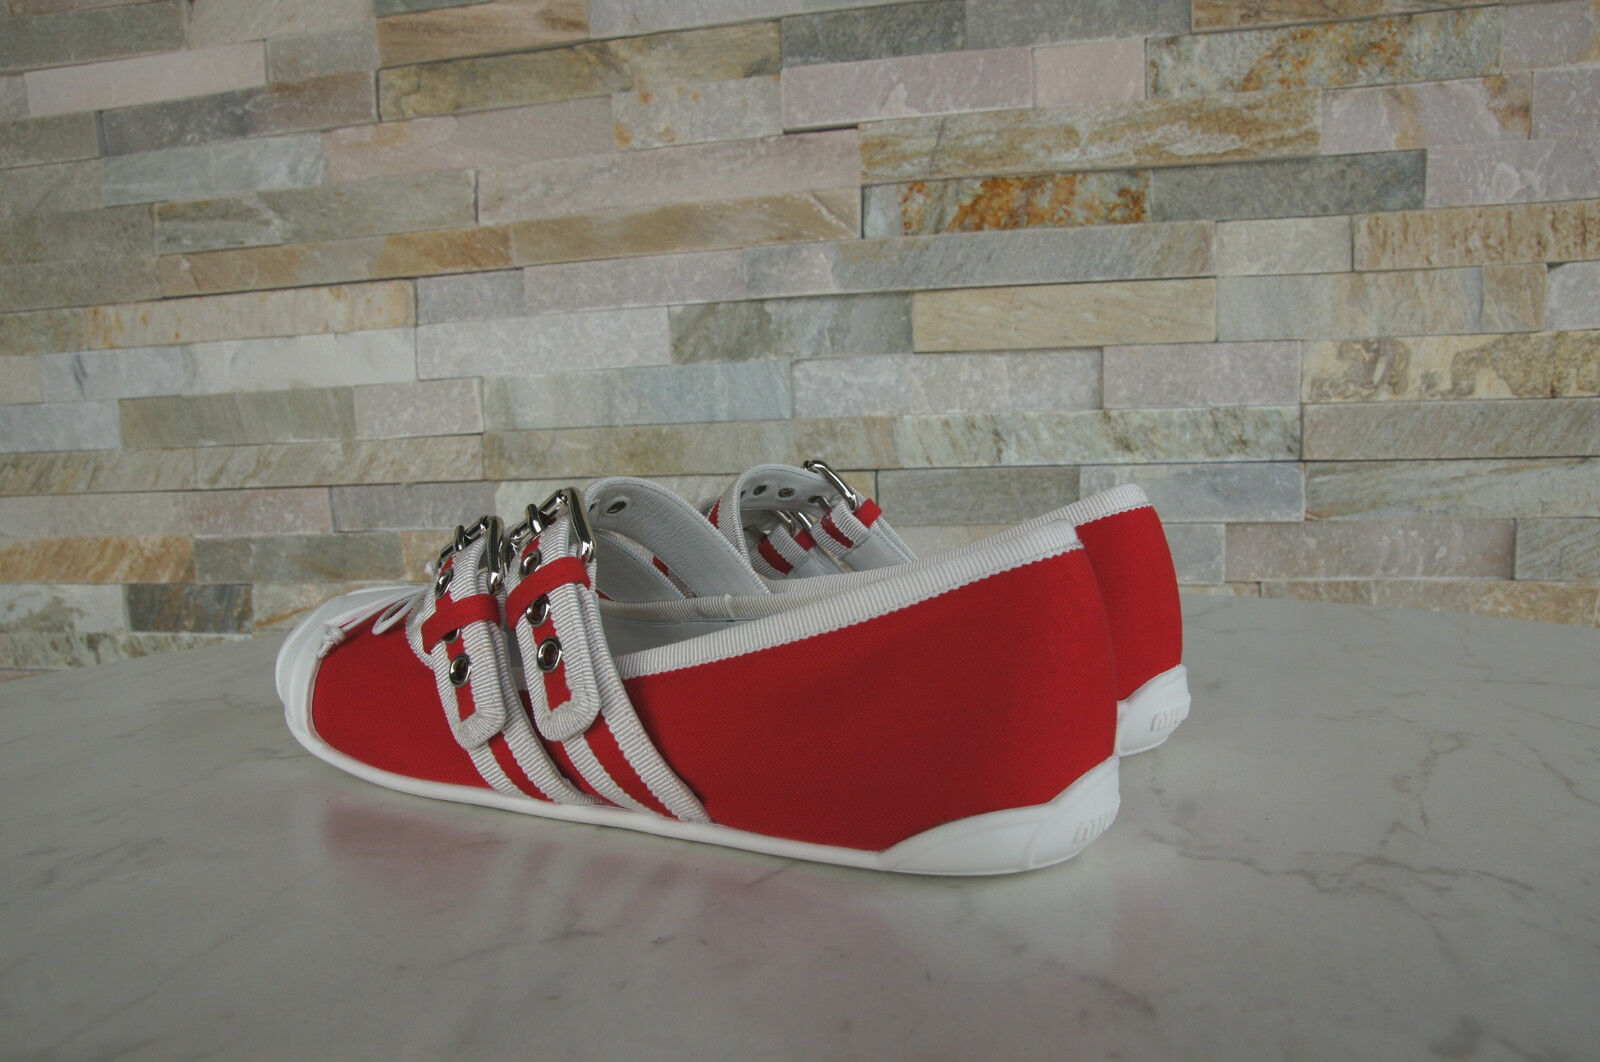 Miu Miu Miu Miu Size 39 Ballerinas Slip on Low shoes Red 5F022B New Previously 89b97a